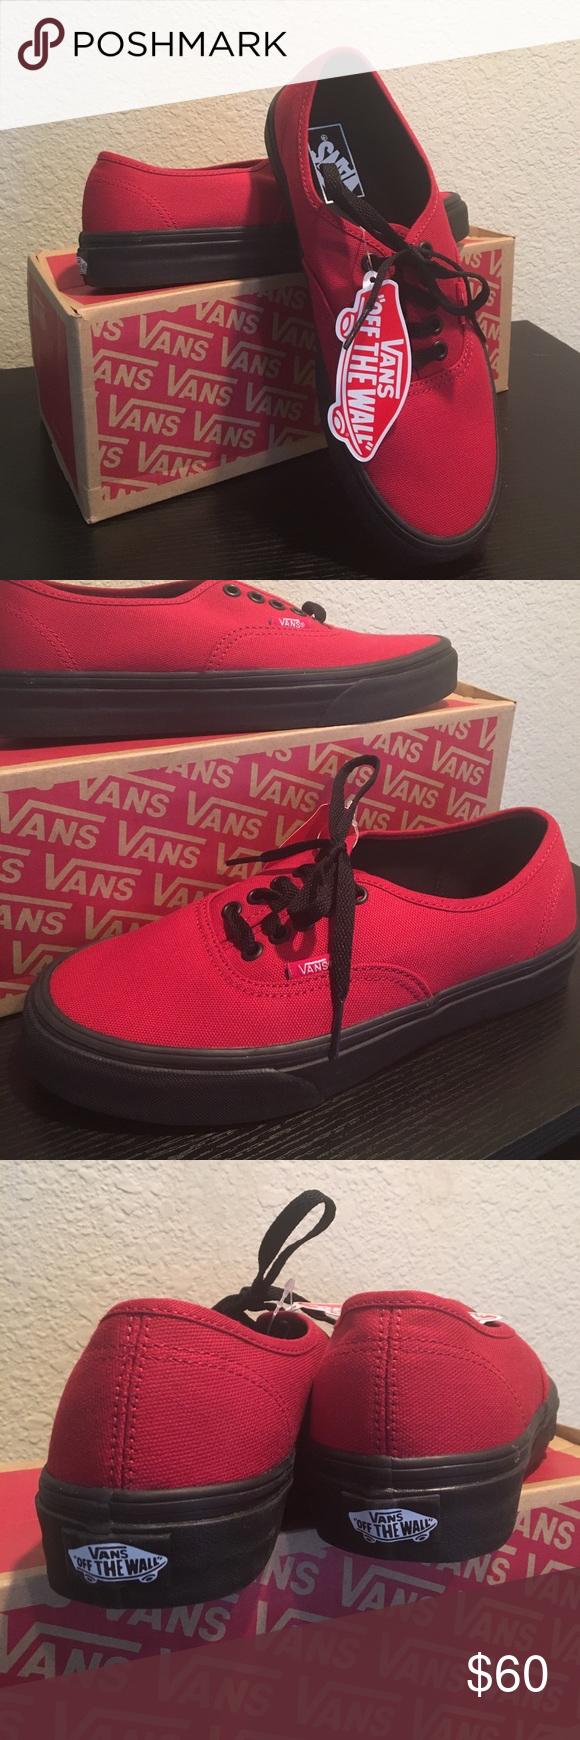 113121c4720 Vans Authentic Black Sole Jester Red Vans New With Box Jester Red Vans Shoes  Athletic Shoes